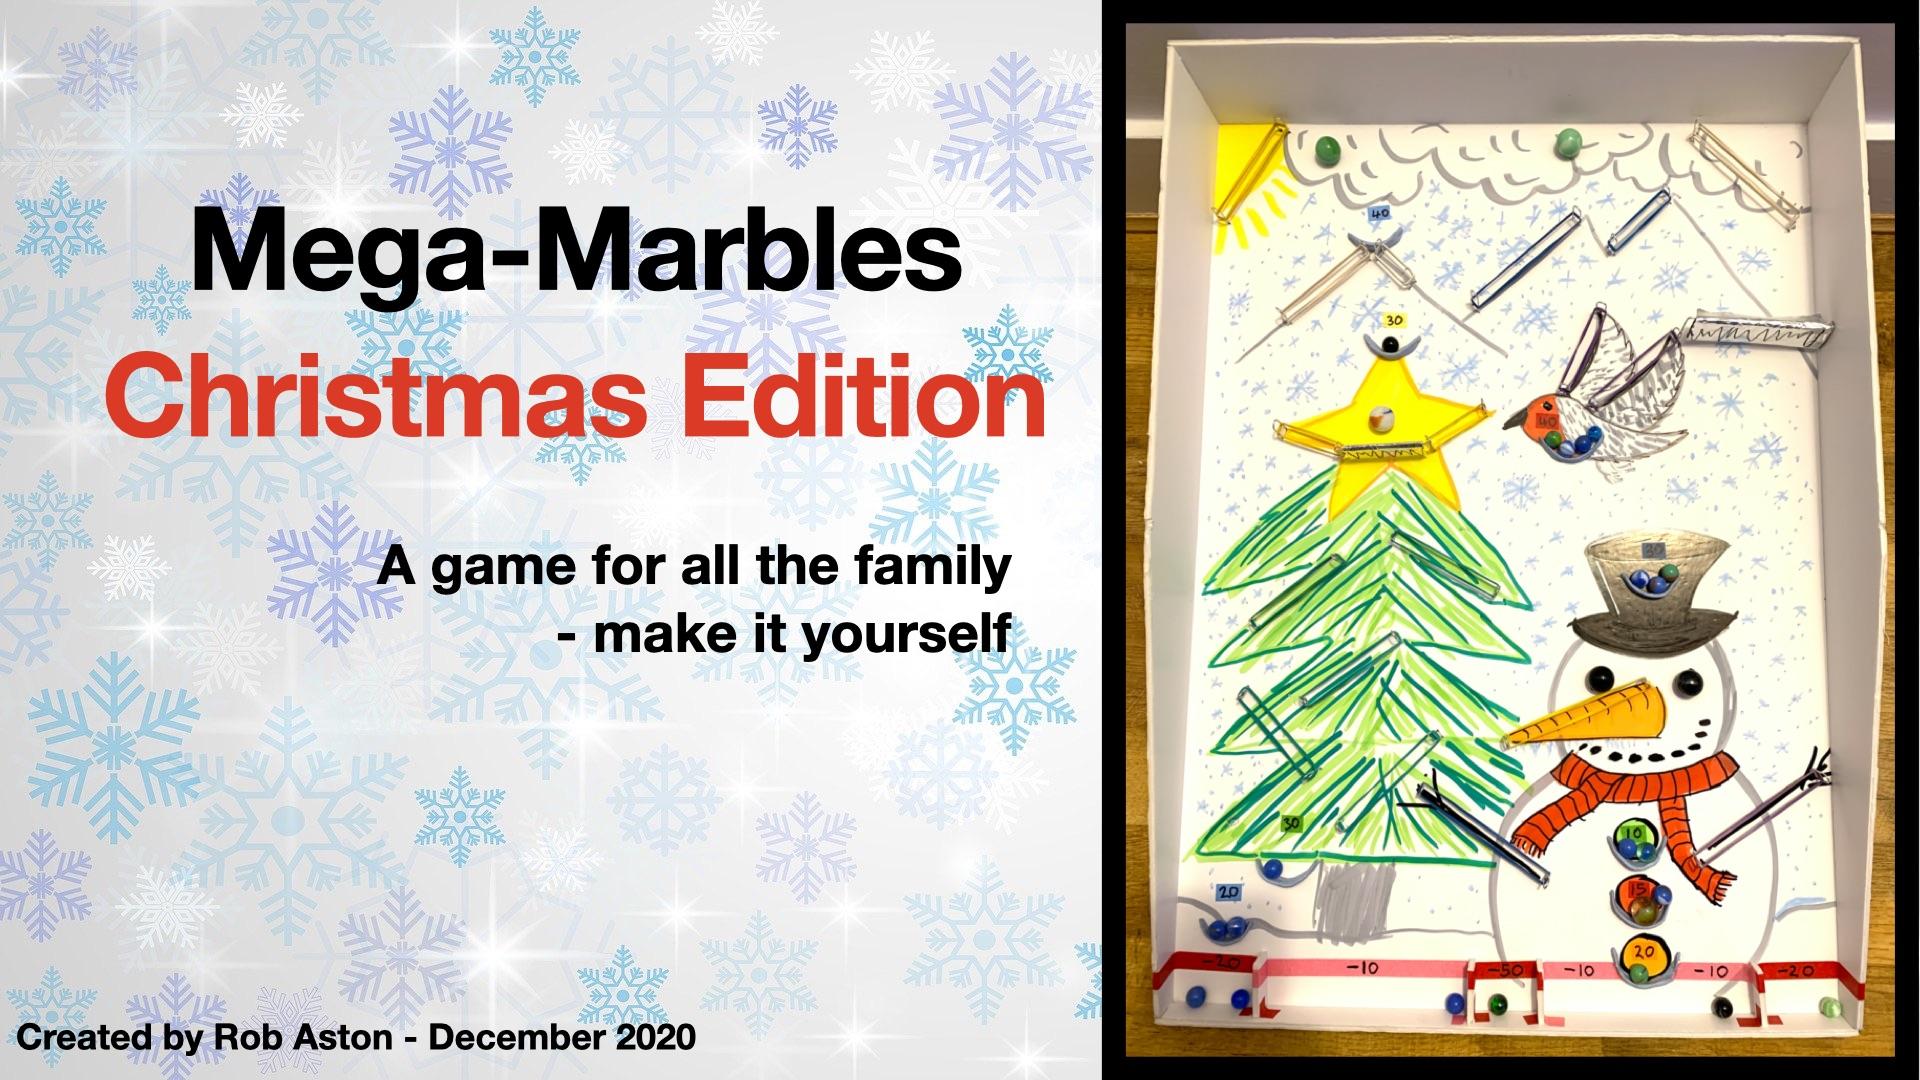 Mega-Marbles Christmas Edition [video]